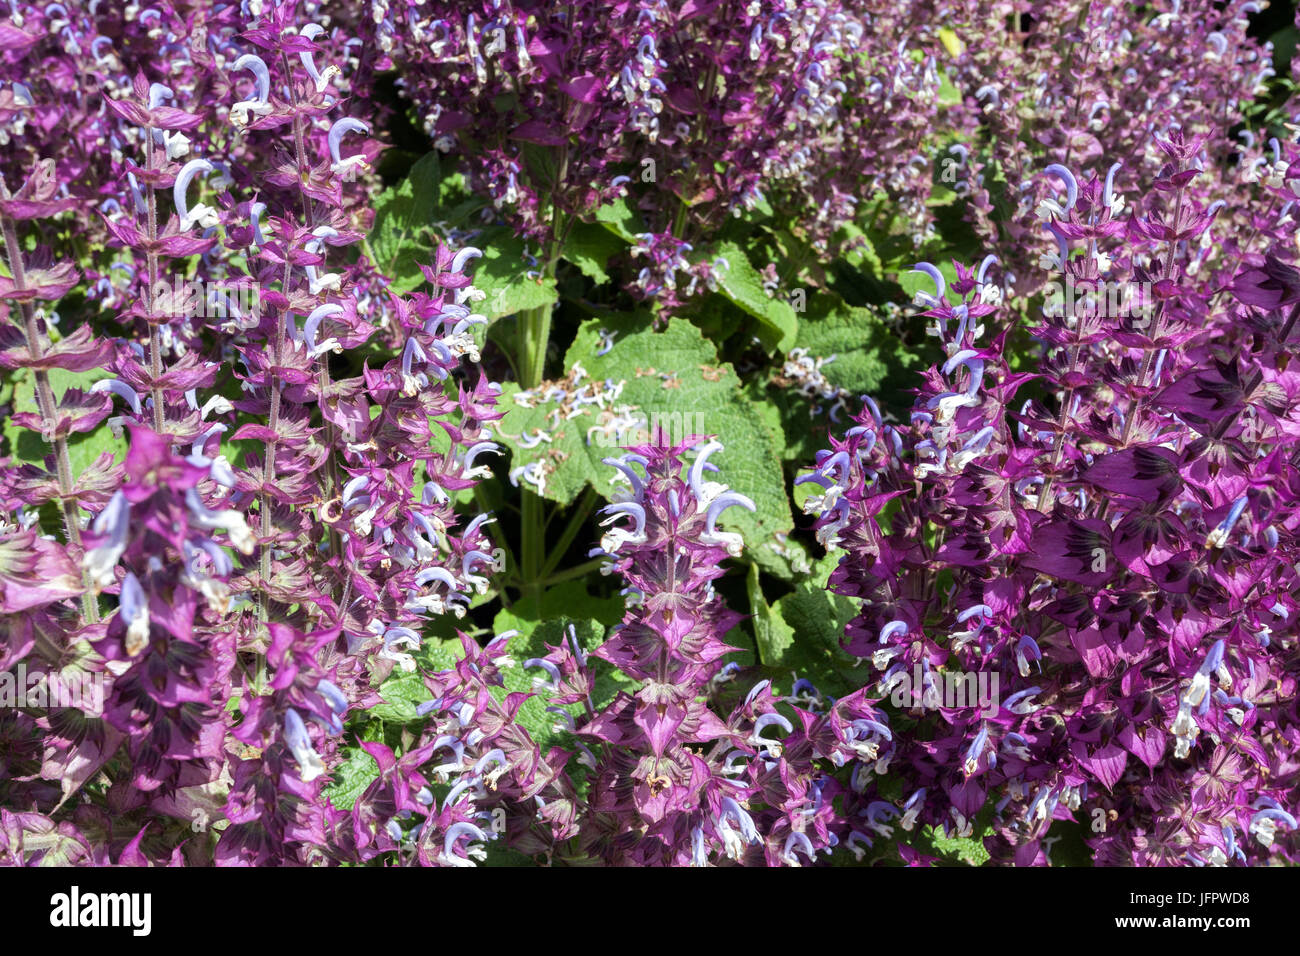 Salvia sclarea 'Piemont', Clary Sage, pink and purple garden - Stock Image